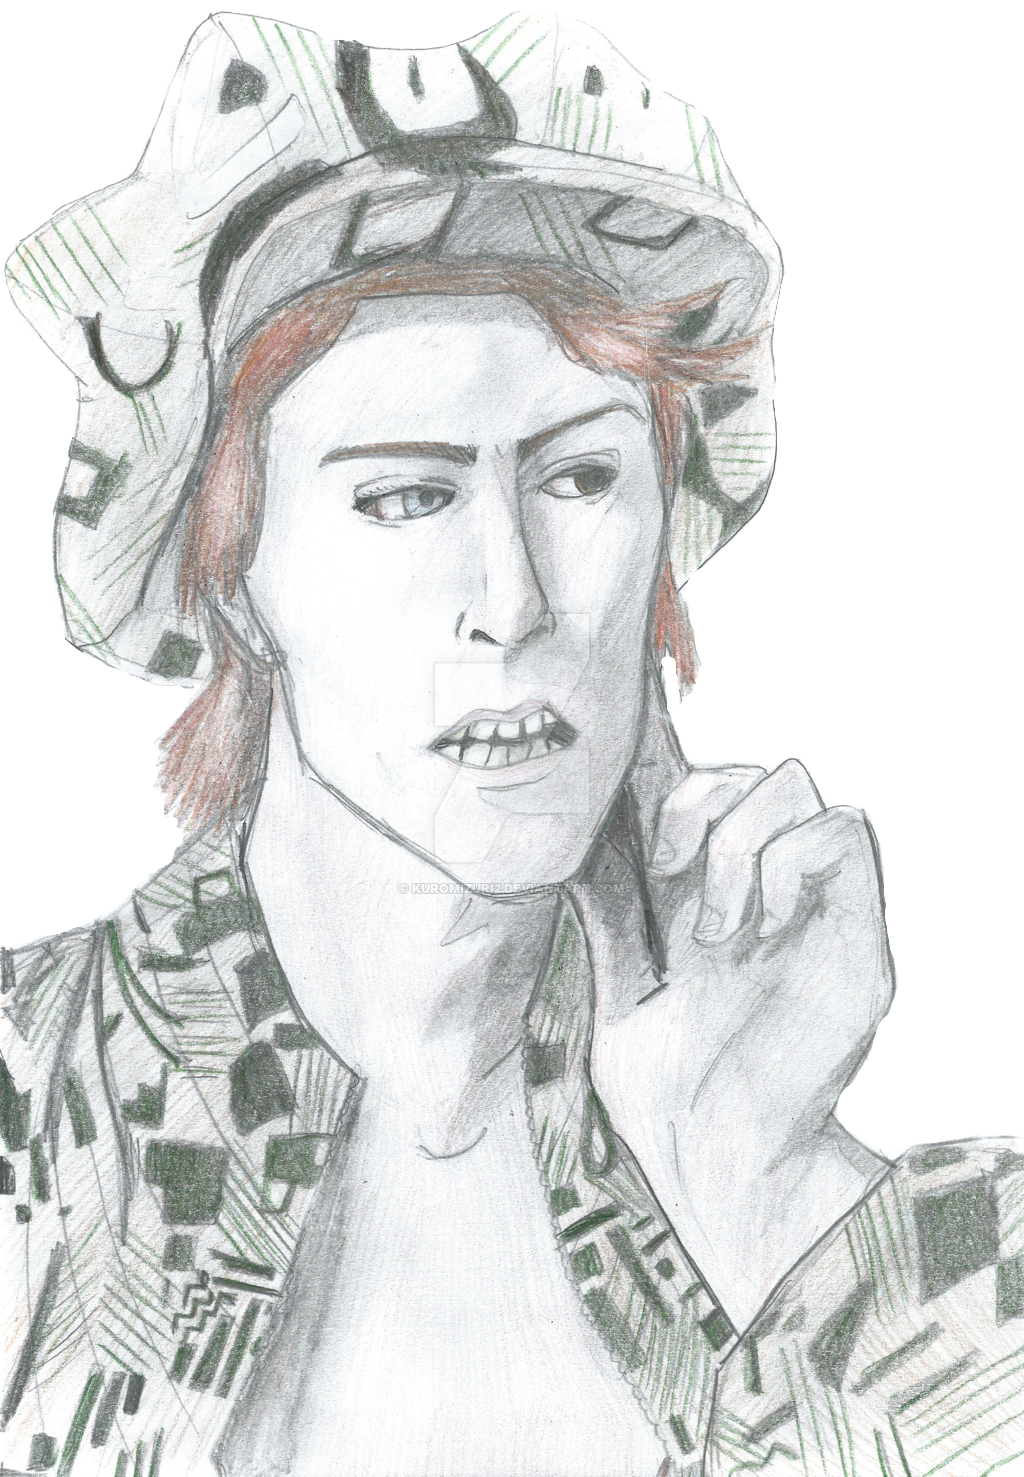 Cartoonized David Bowie Drawing By Iluarts On Deviantart